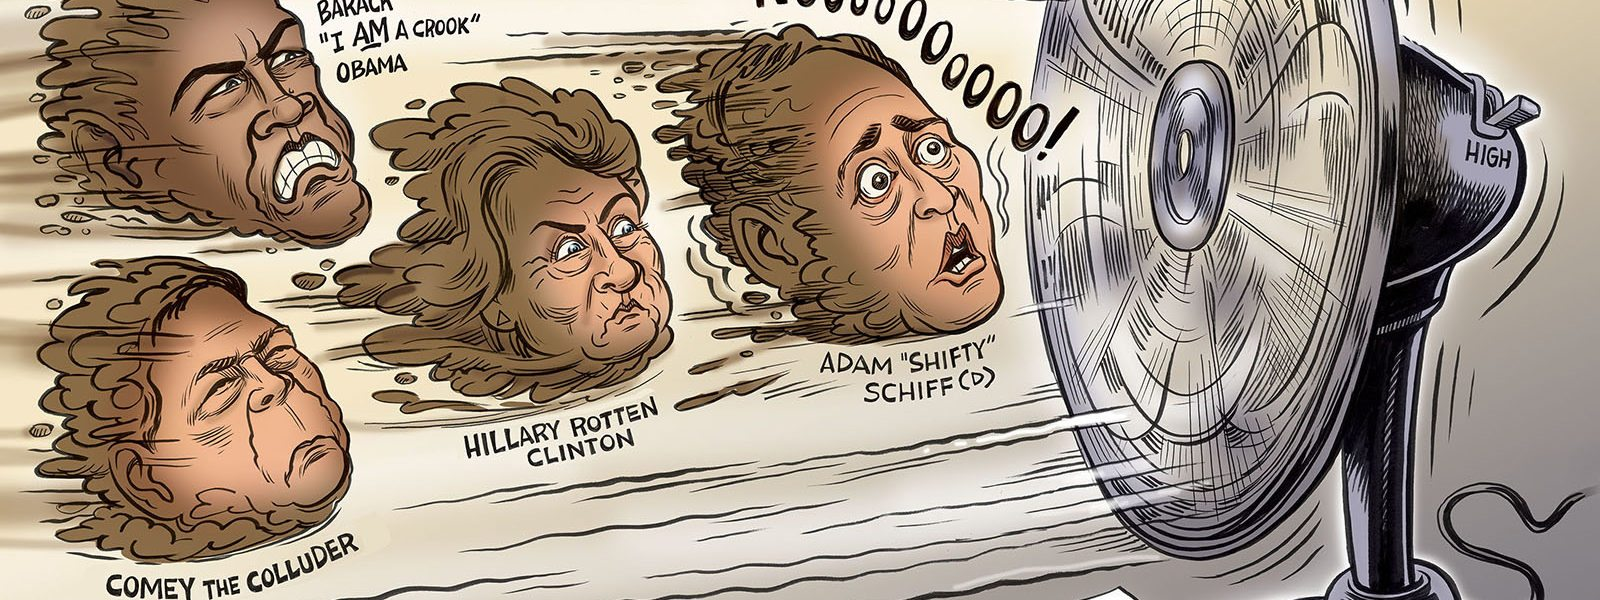 The Schiff Hits the Fan